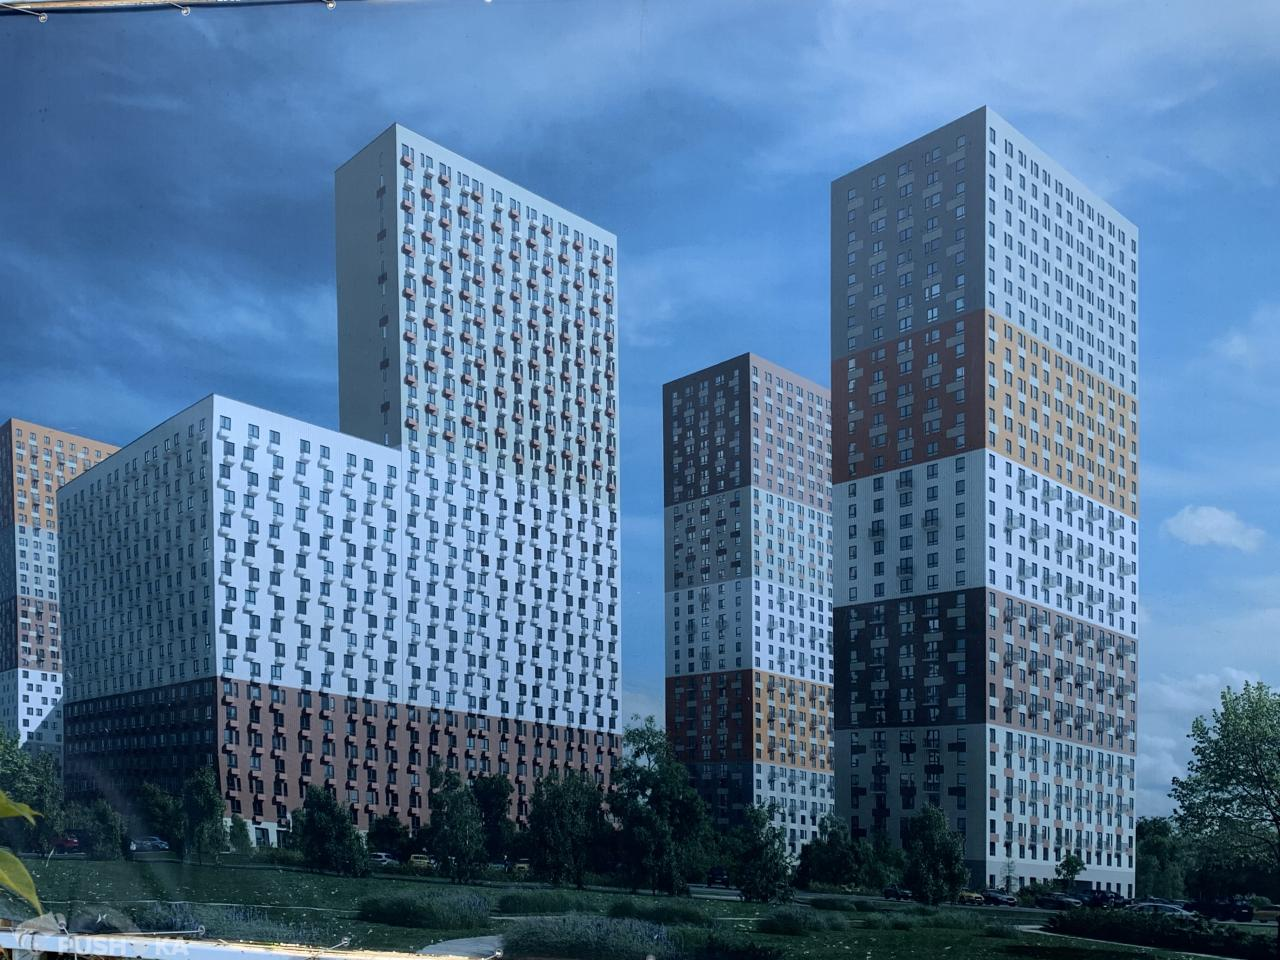 Продаётся 1-комнатная квартира 41.9 кв.м. этаж 4/33 за 7 650 000 руб